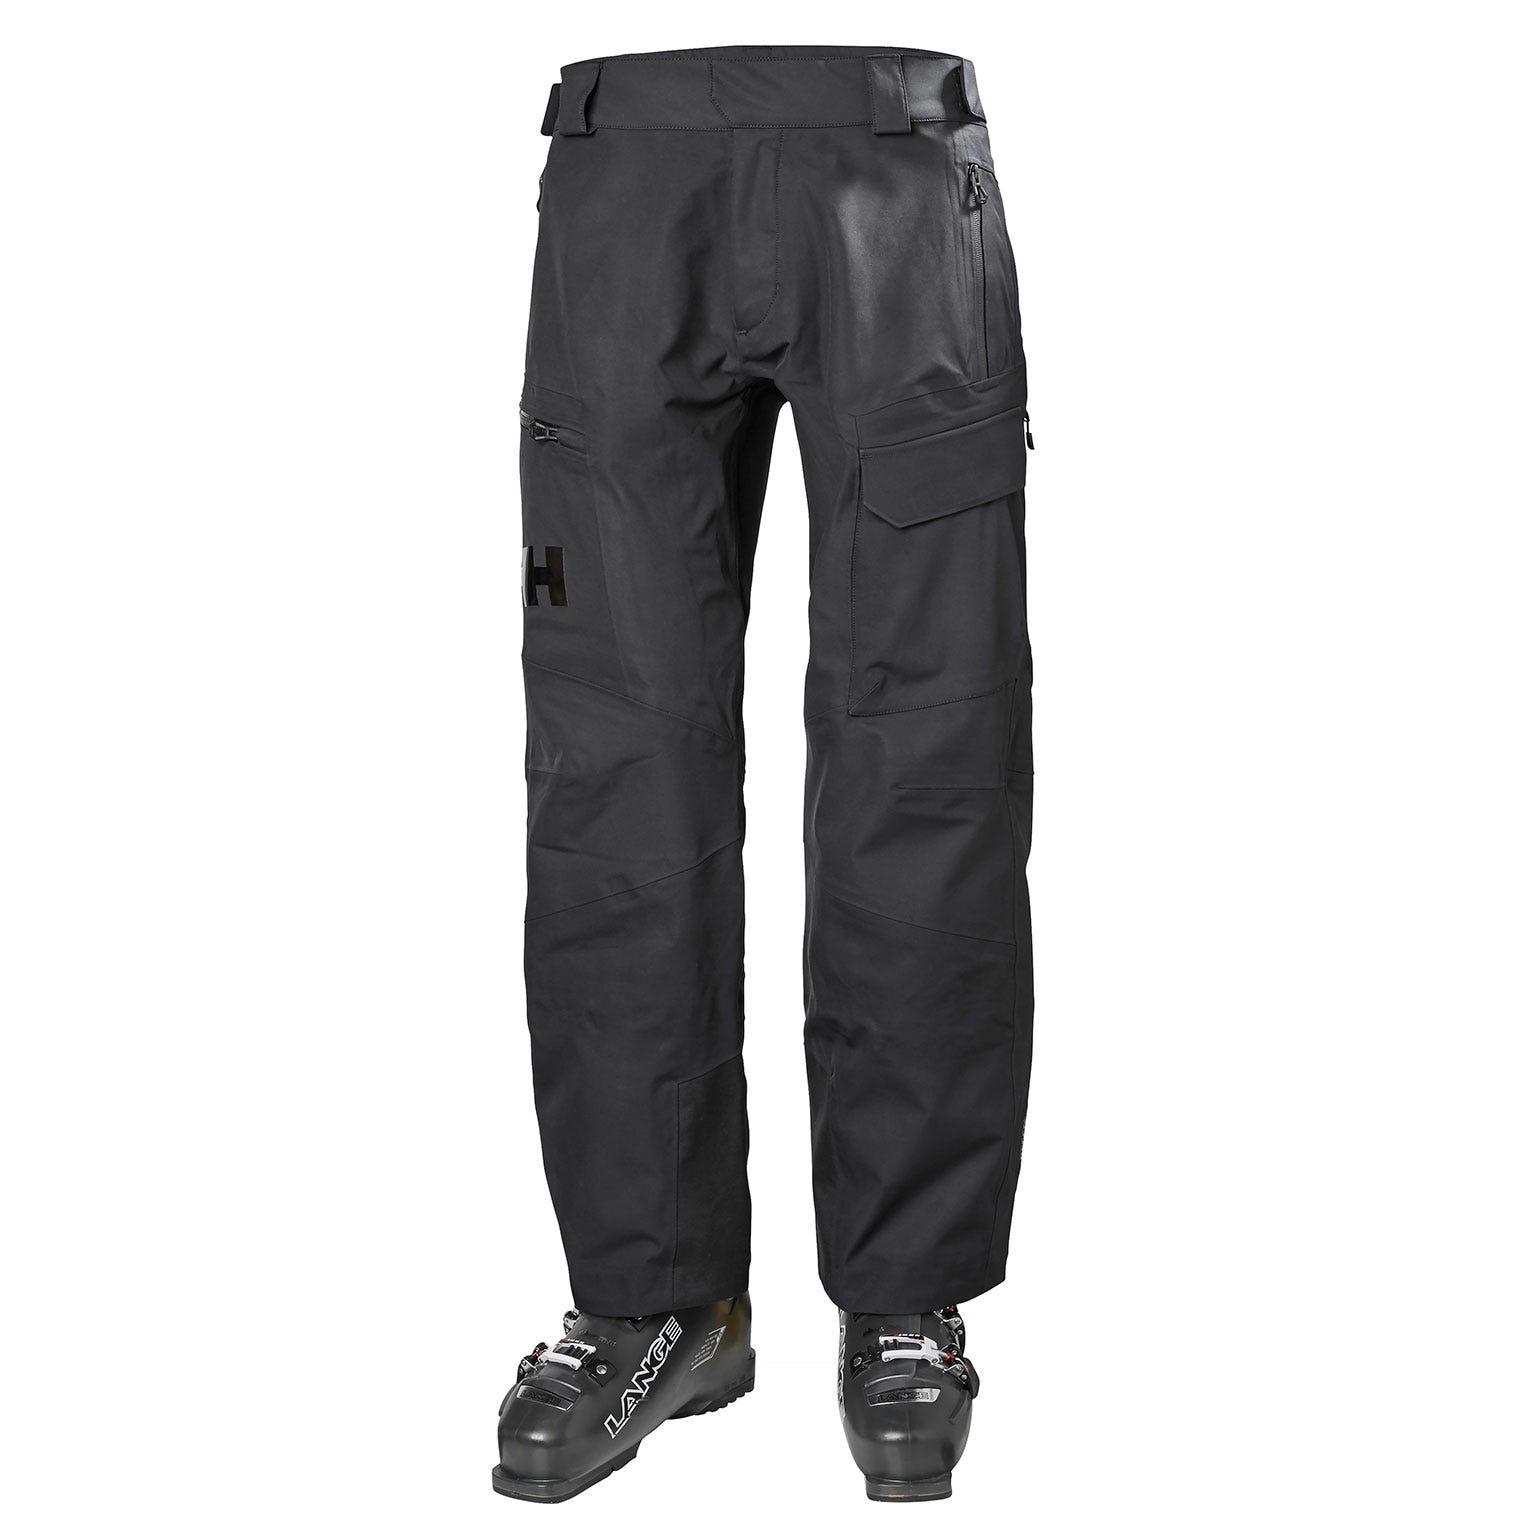 Helly Hansen Ridge Shell Pant Mens Ski Black S